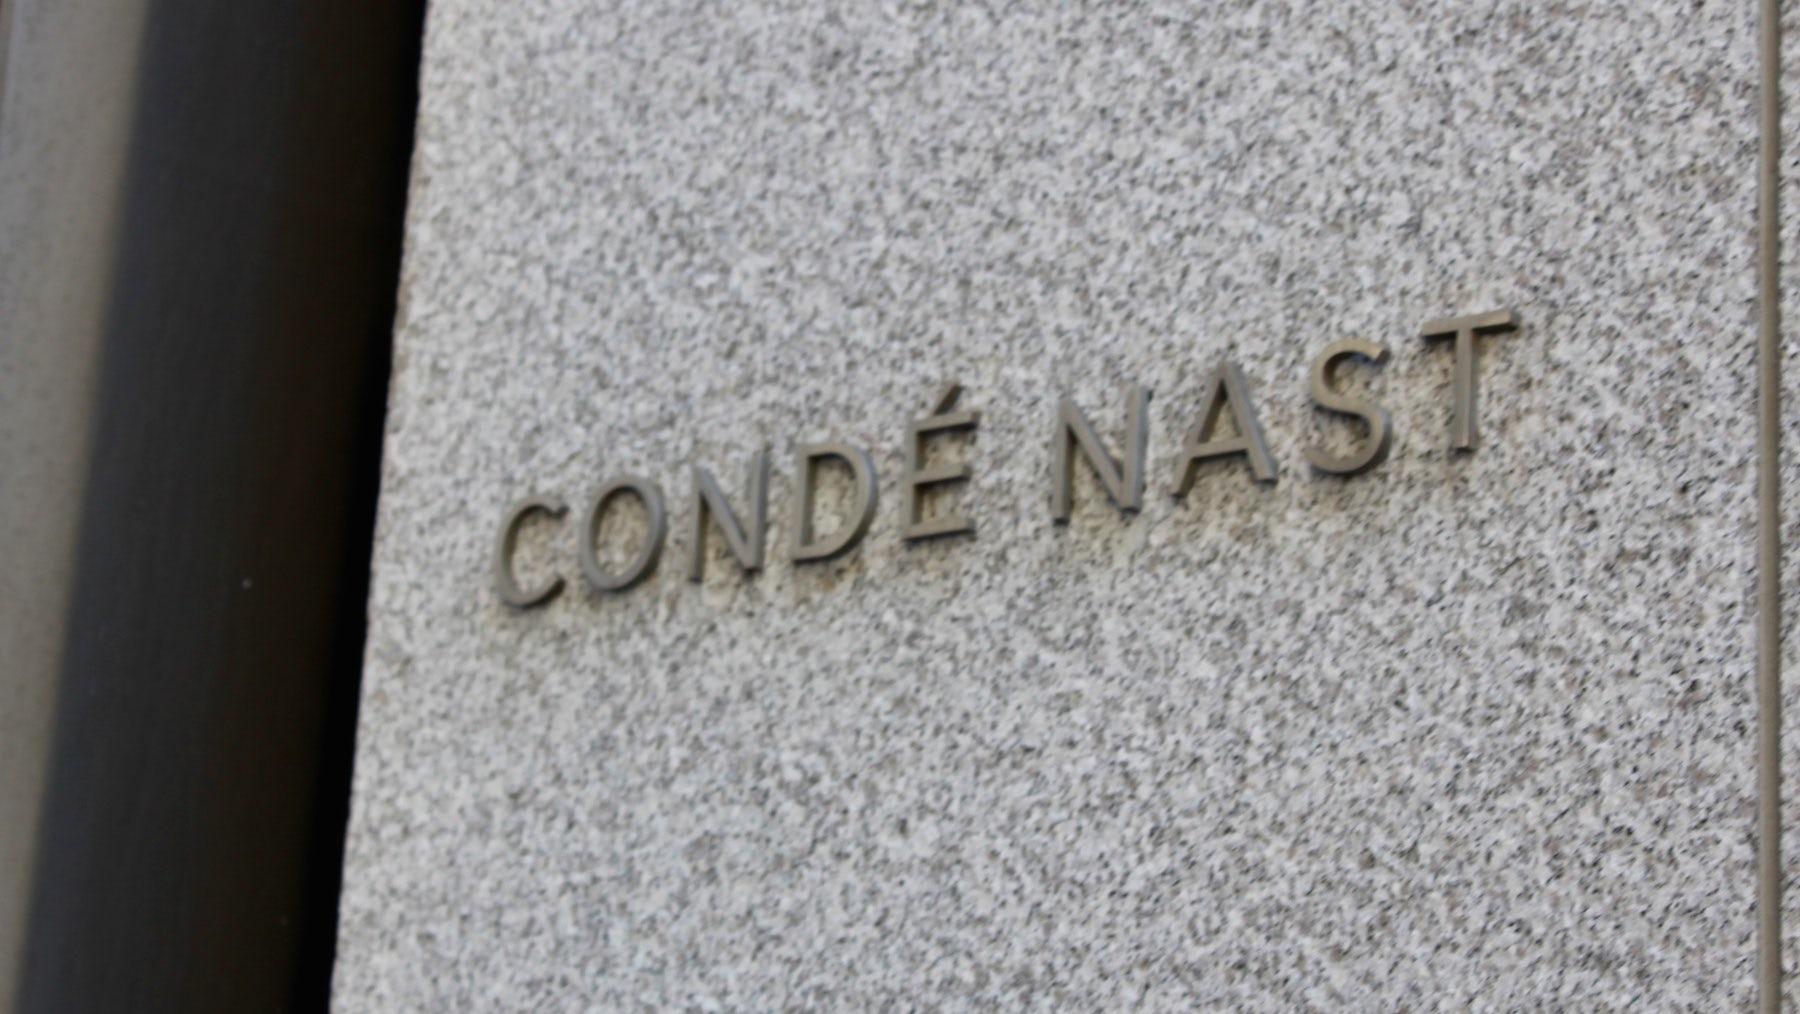 The Condé Nast headquarters at One World Trade Center, New York | Source: Flickr/ShinyaSuzuki